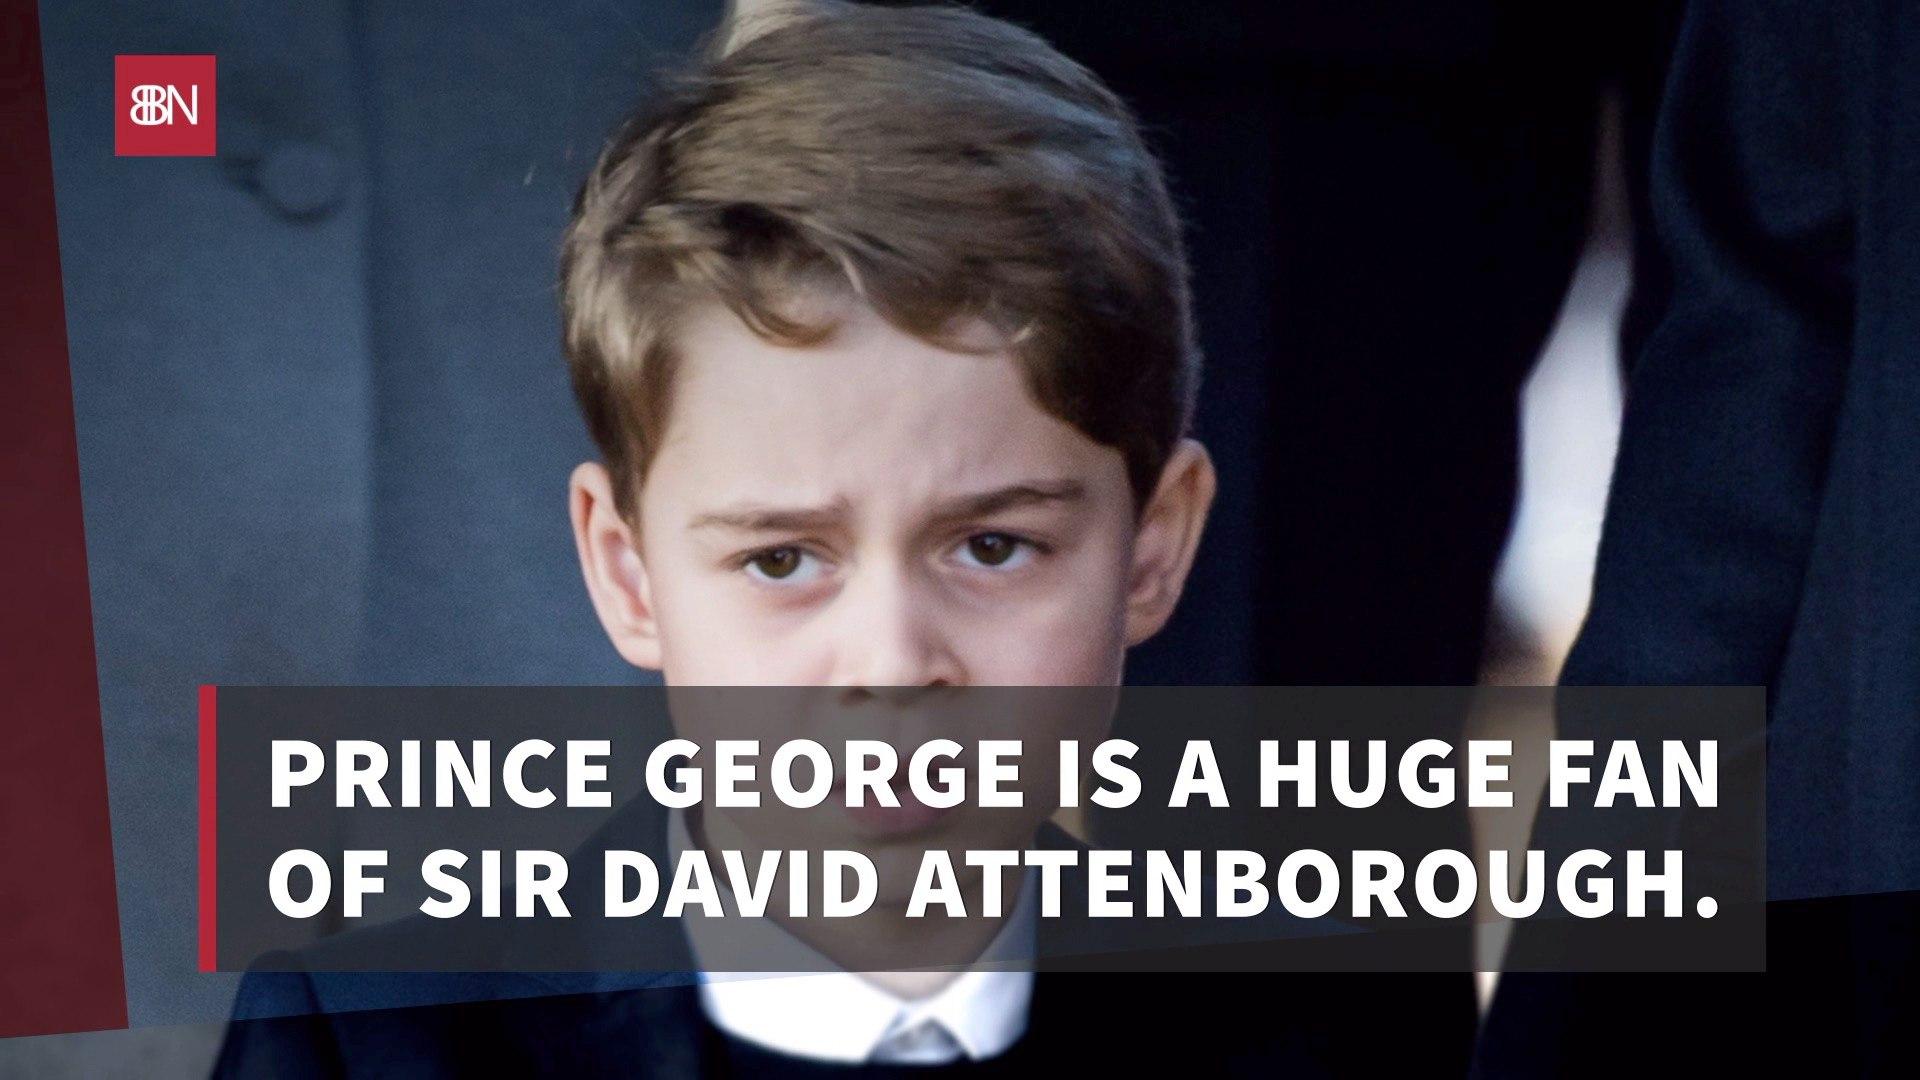 Prince George Has Favorite Shows